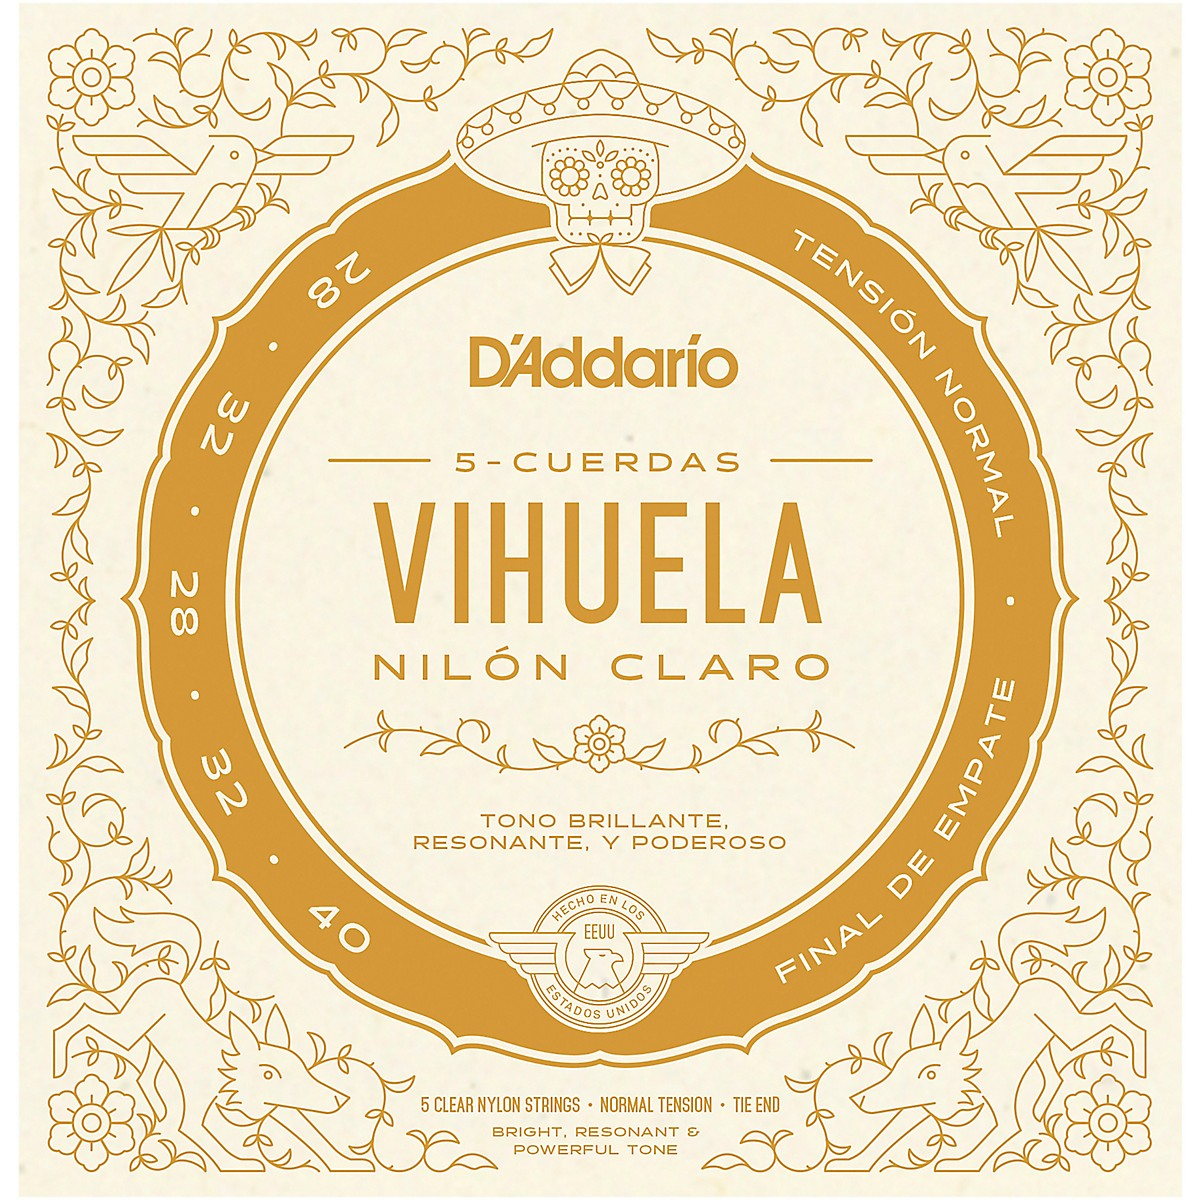 D'Addario Vihuela 5 String Set, Clear Nylon, Normal Tension